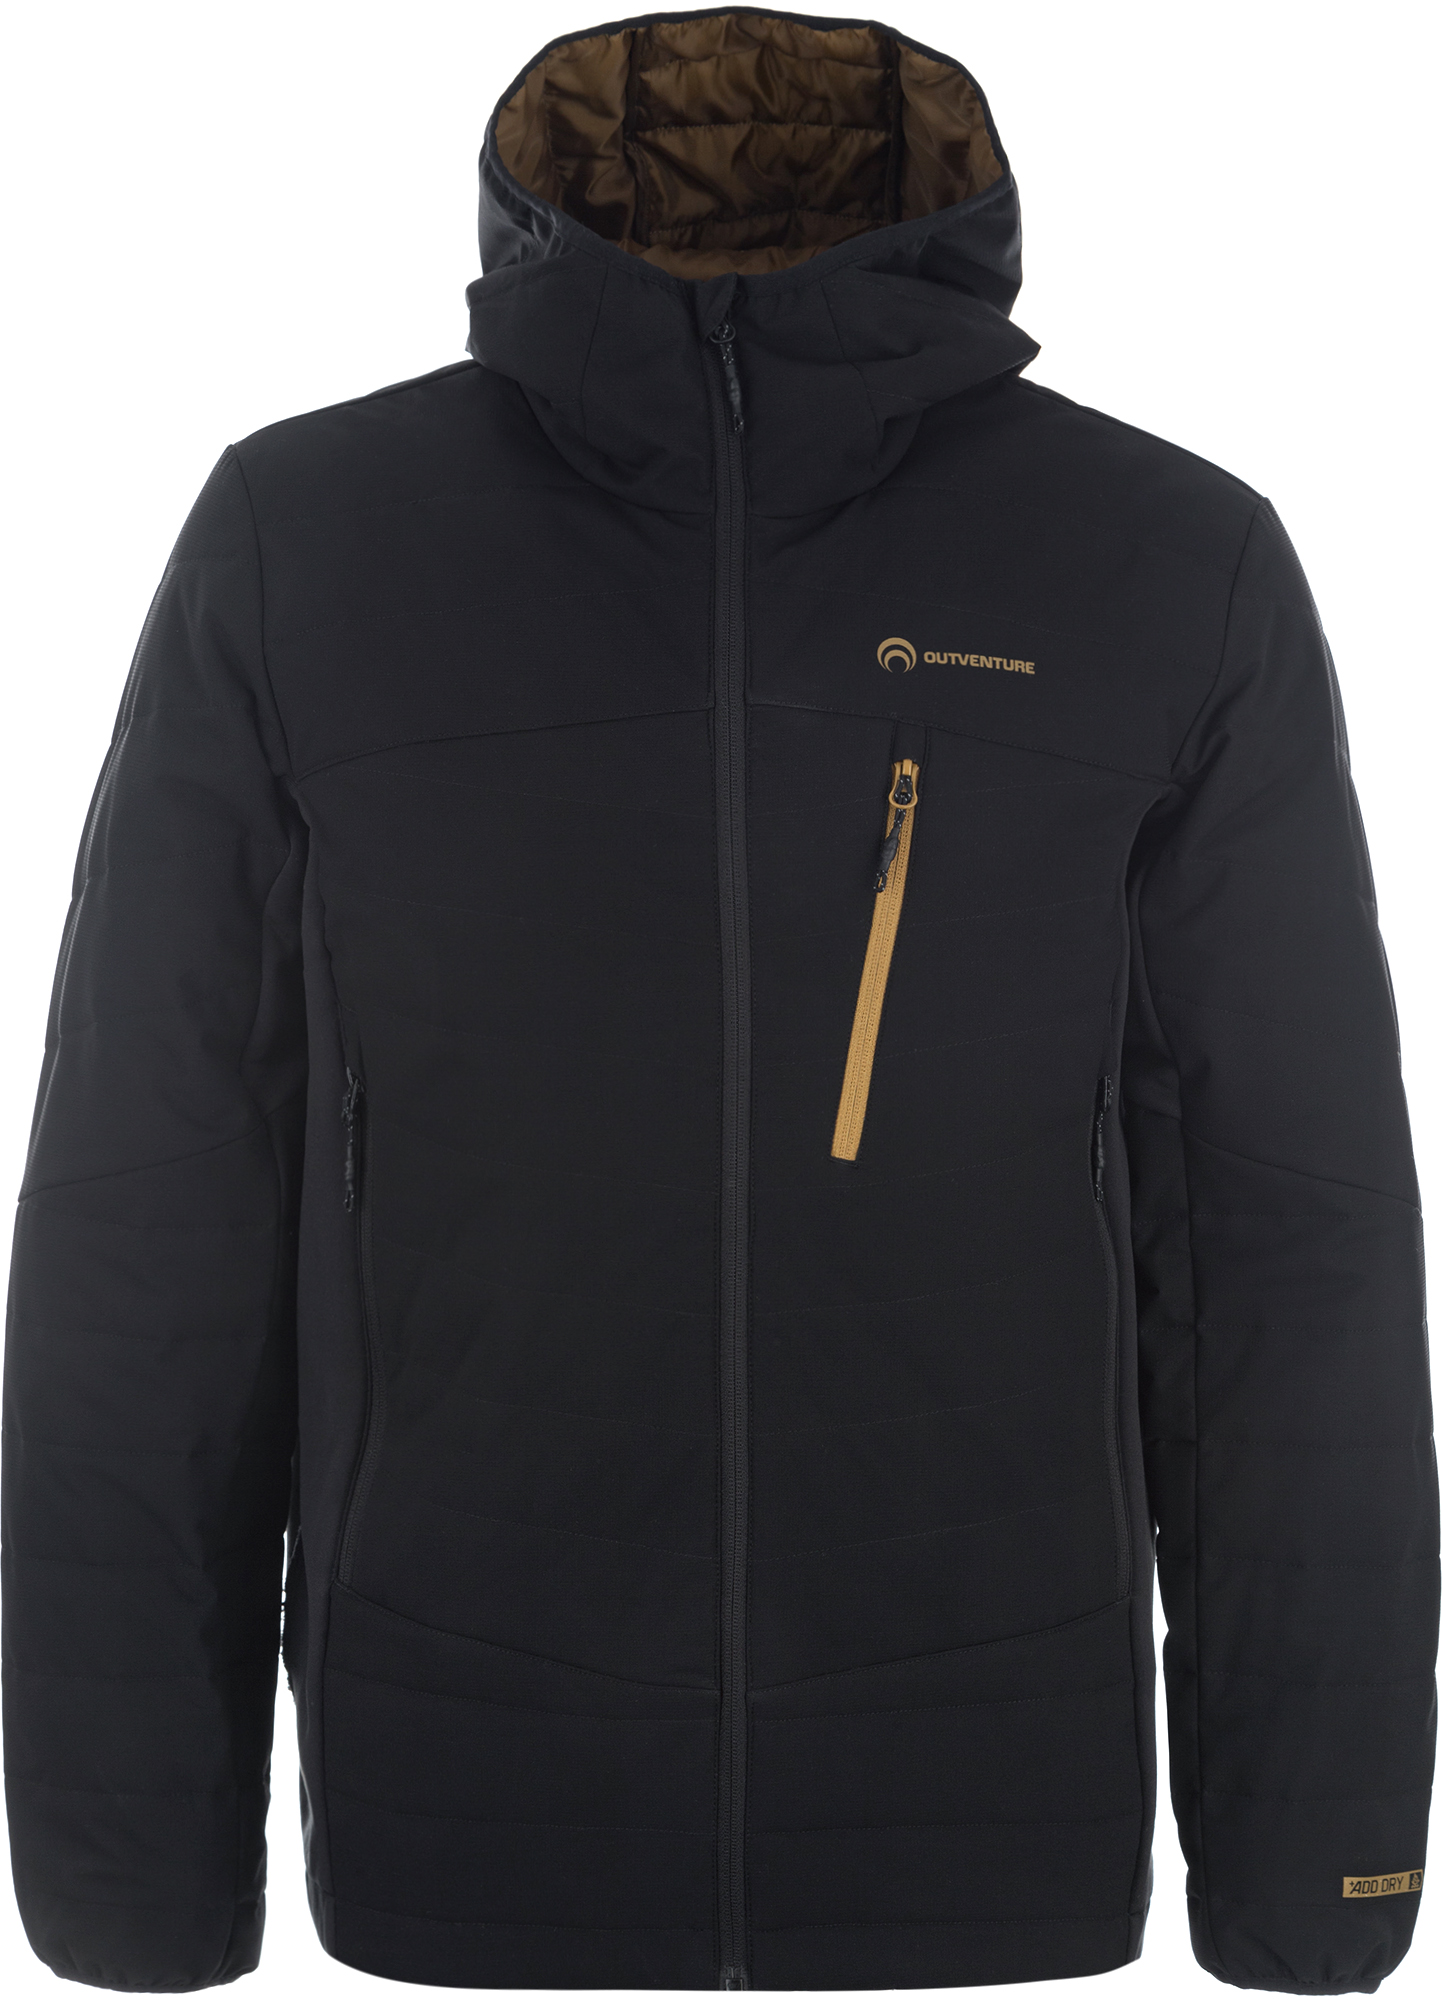 Outventure Куртка утепленная мужская Outventure, размер 50 куртка мужская geox цвет темно синий m8220kt2447f4386 размер 54